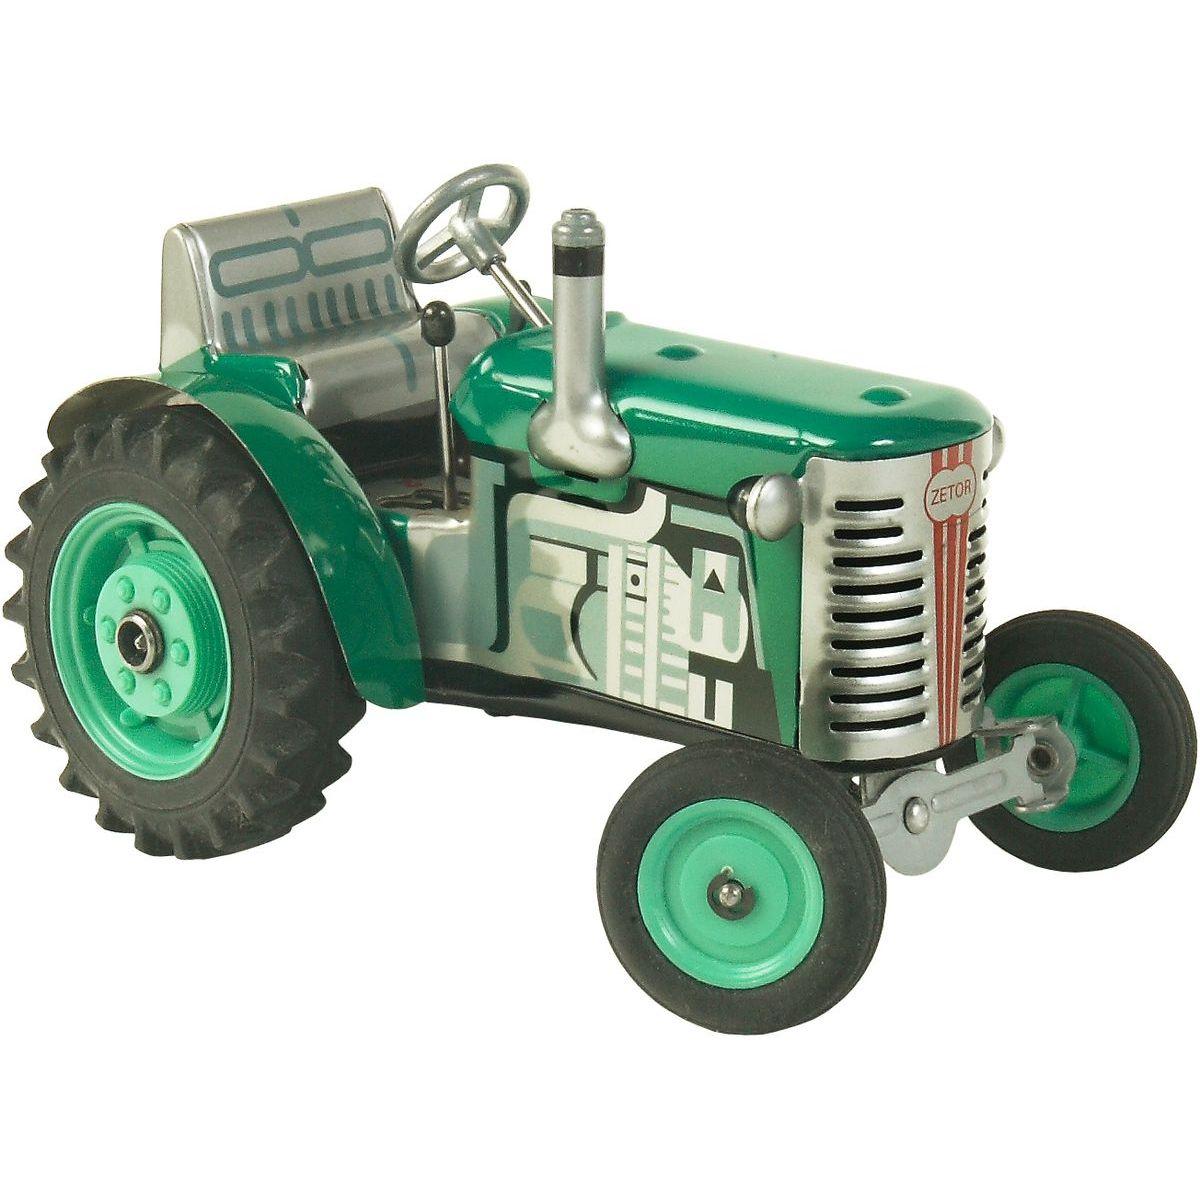 KOVAP Traktor Zetor zelený